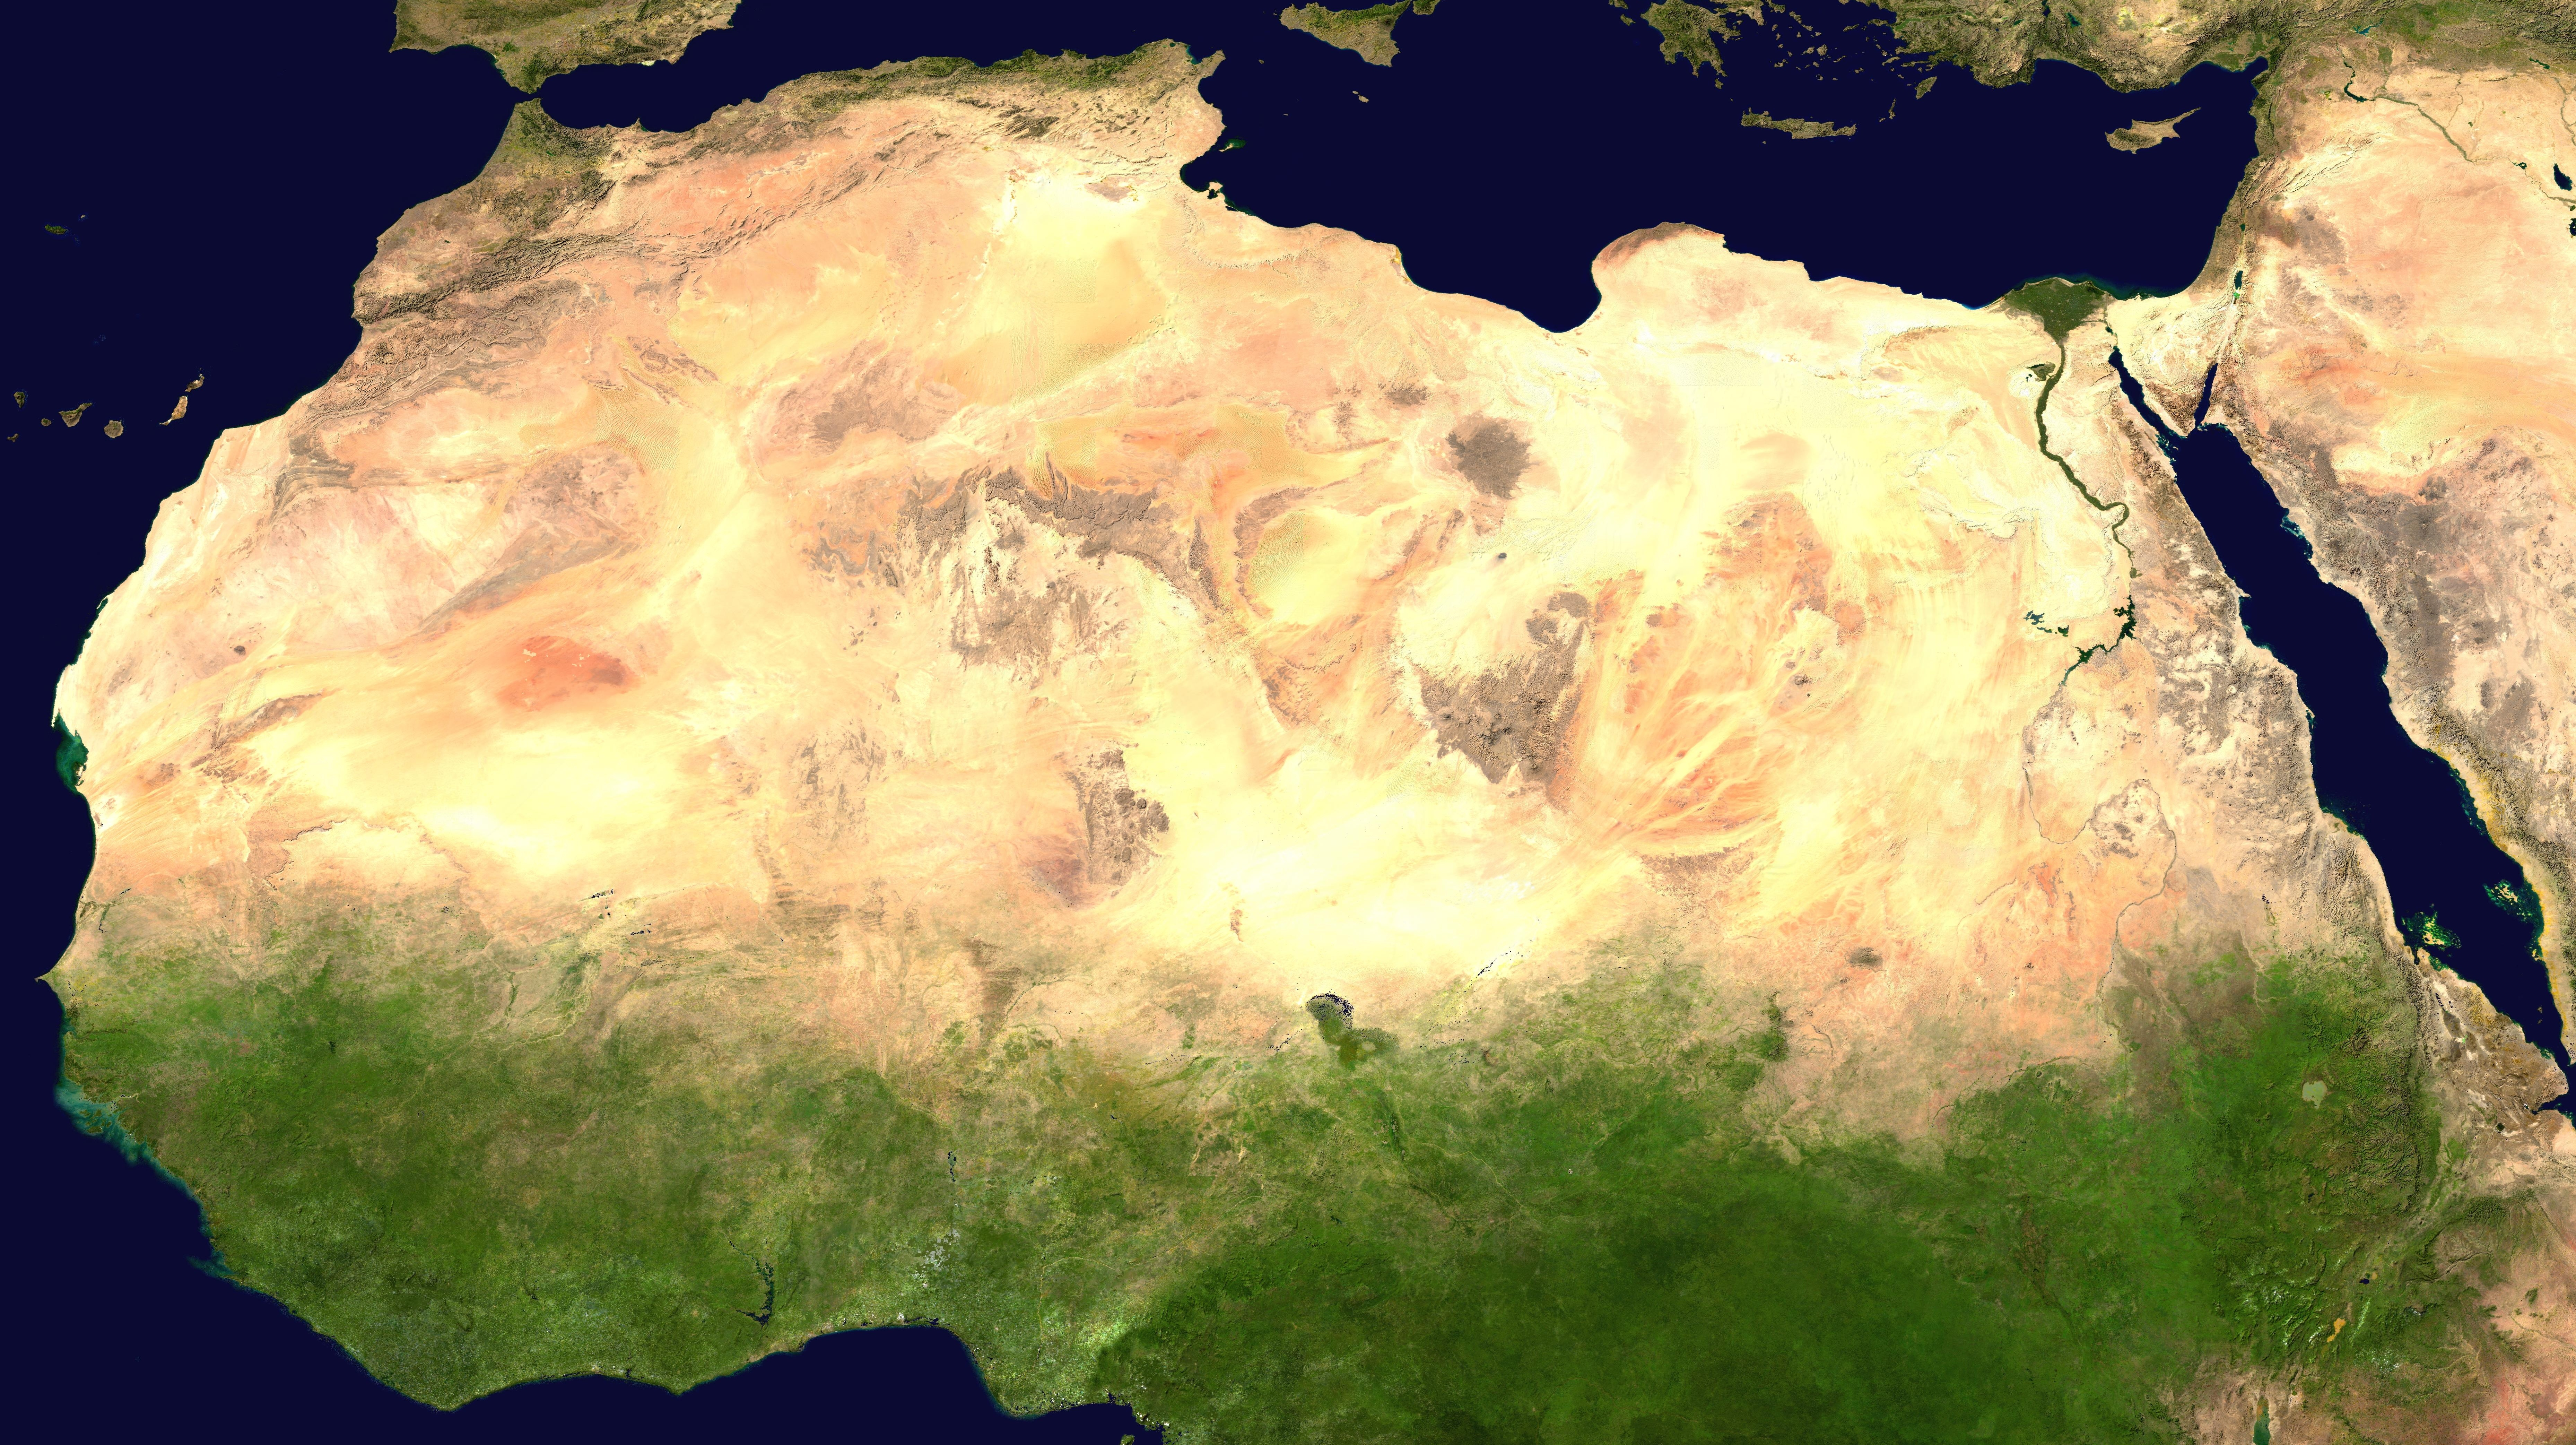 Vista satelital del desierto del Sahara.